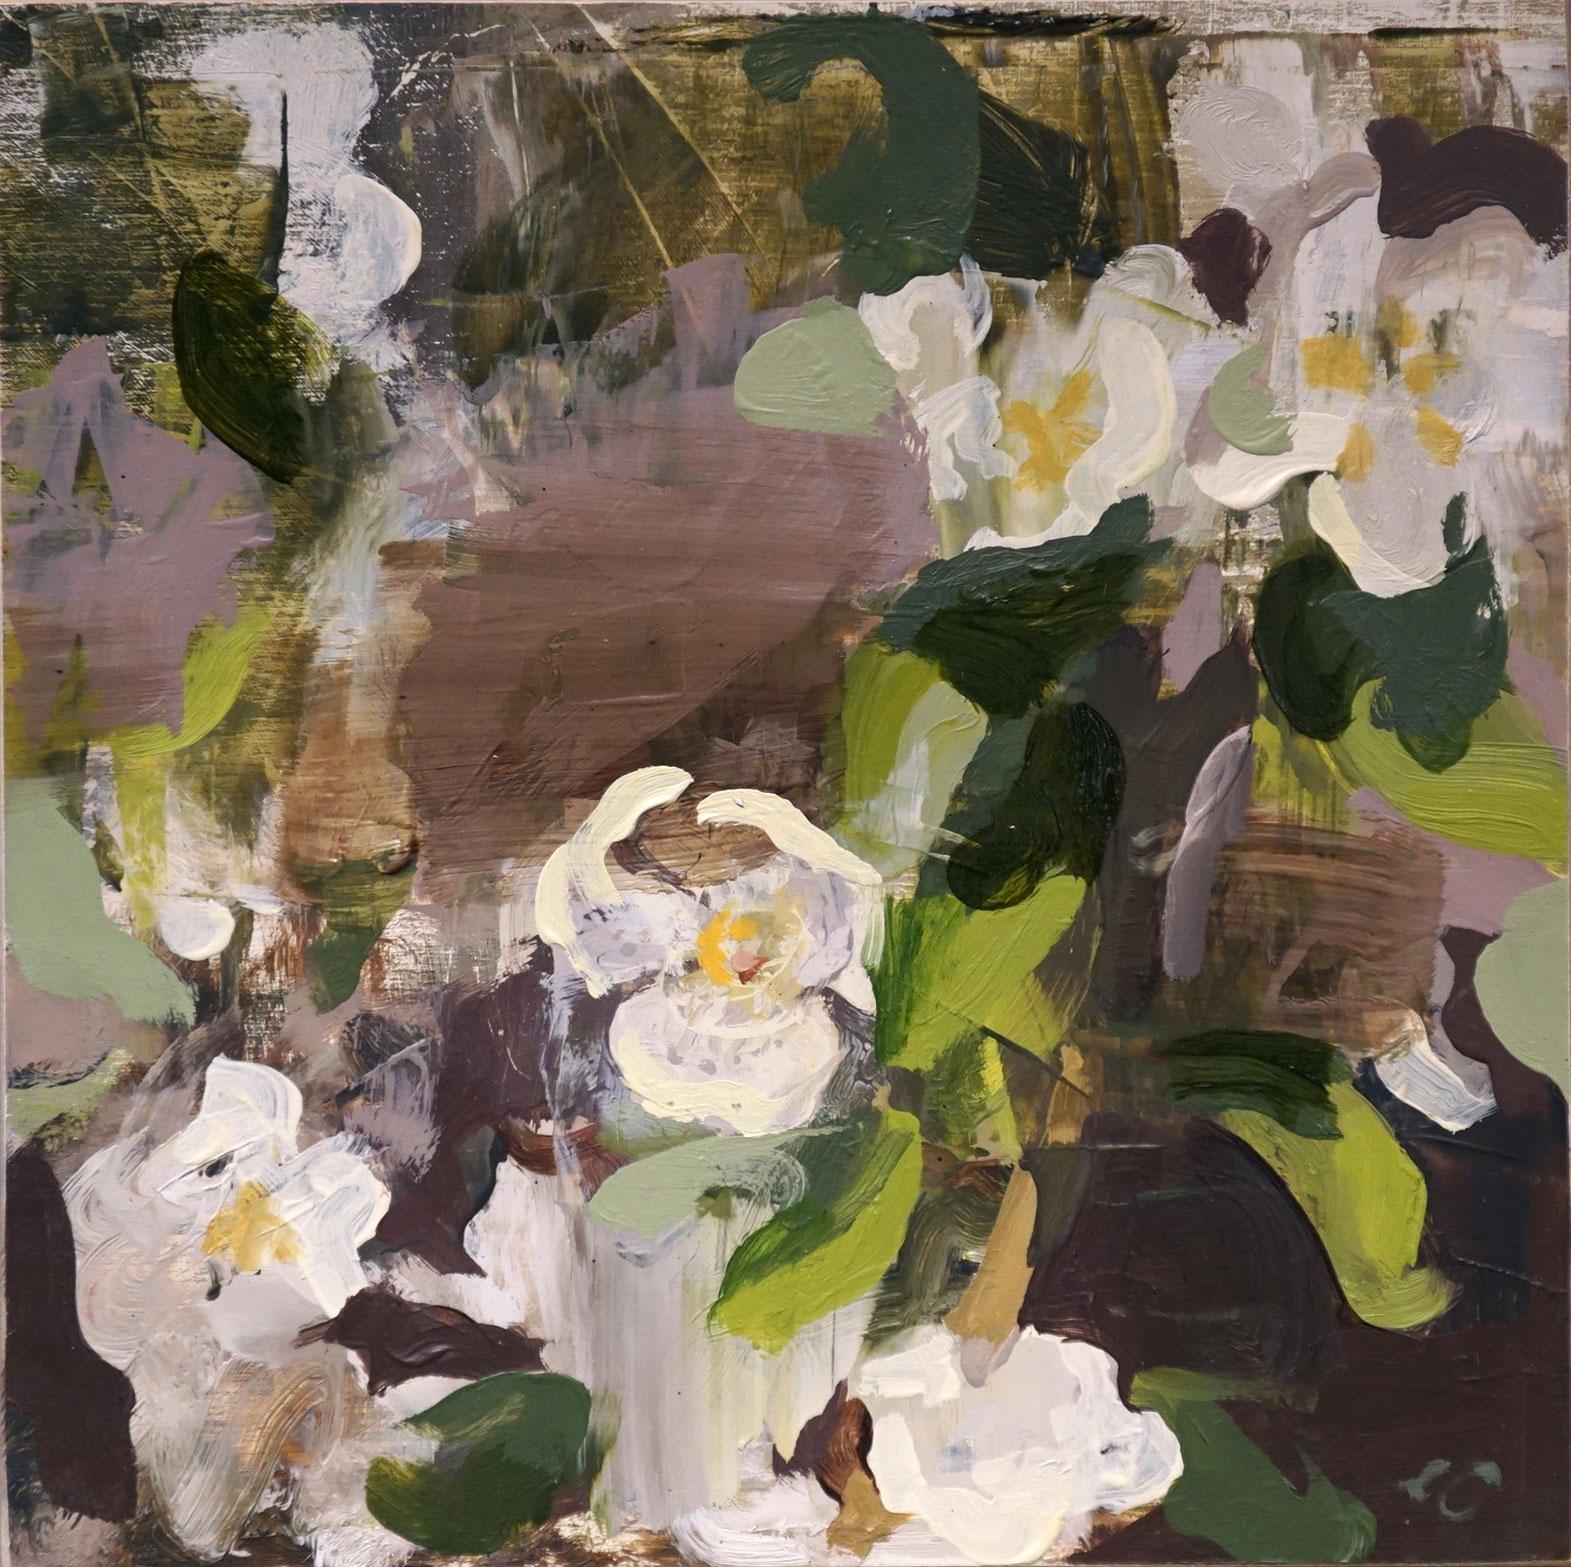 mark-crenshaw-1651-pear-blossom-abstract.jpg